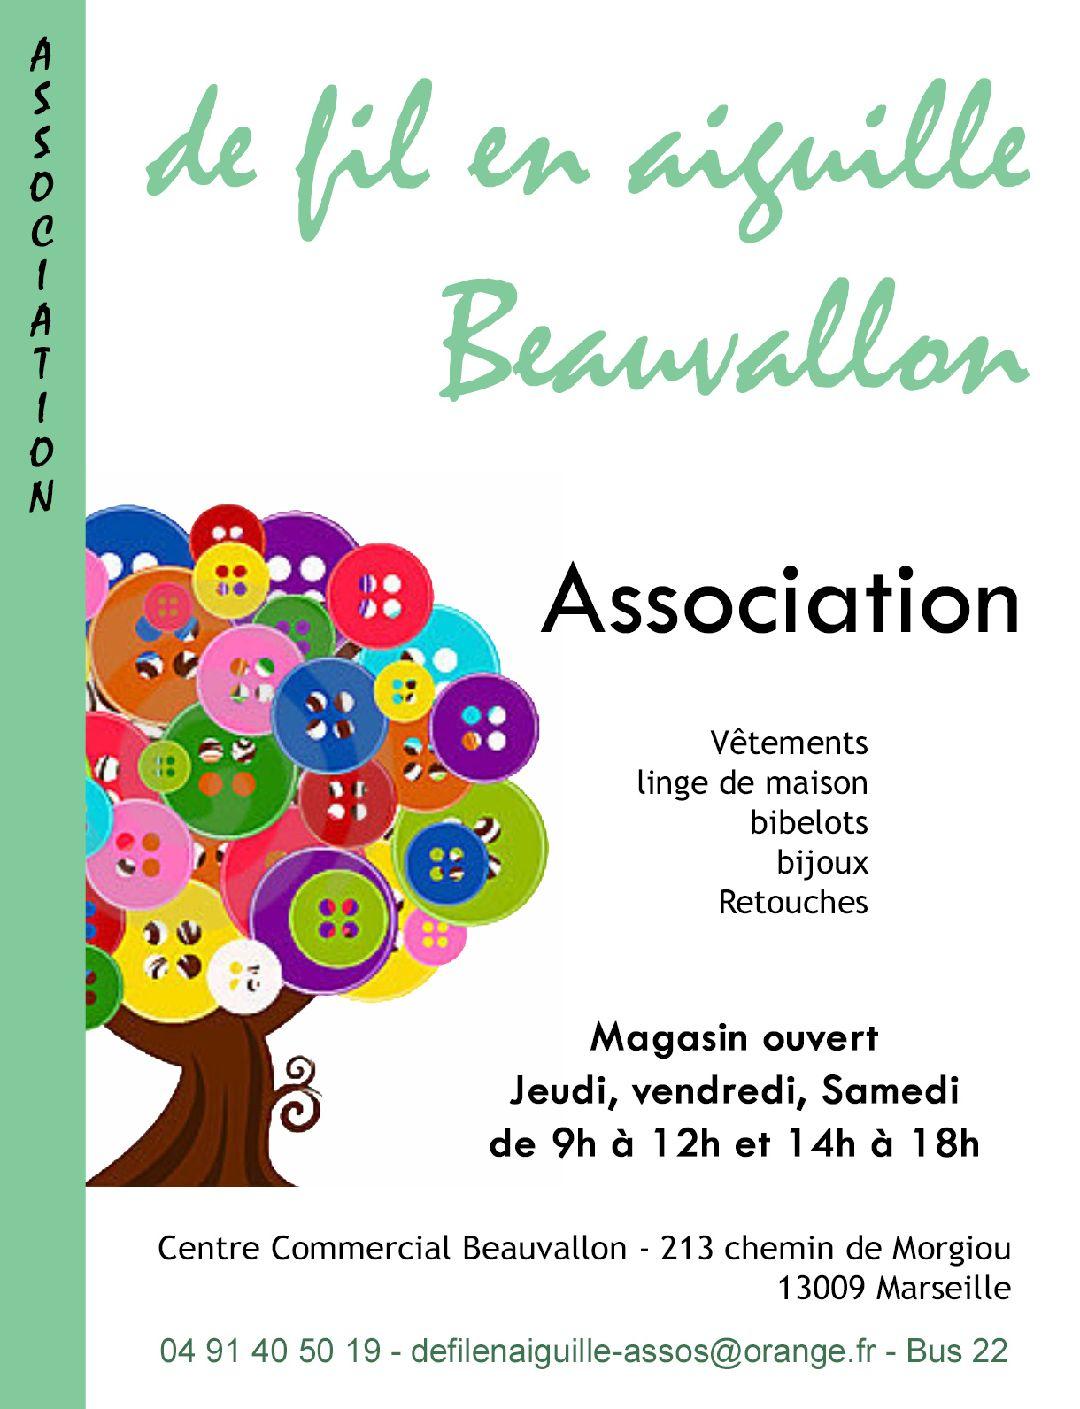 Resized_2018_11_21_association_Beauvallon_